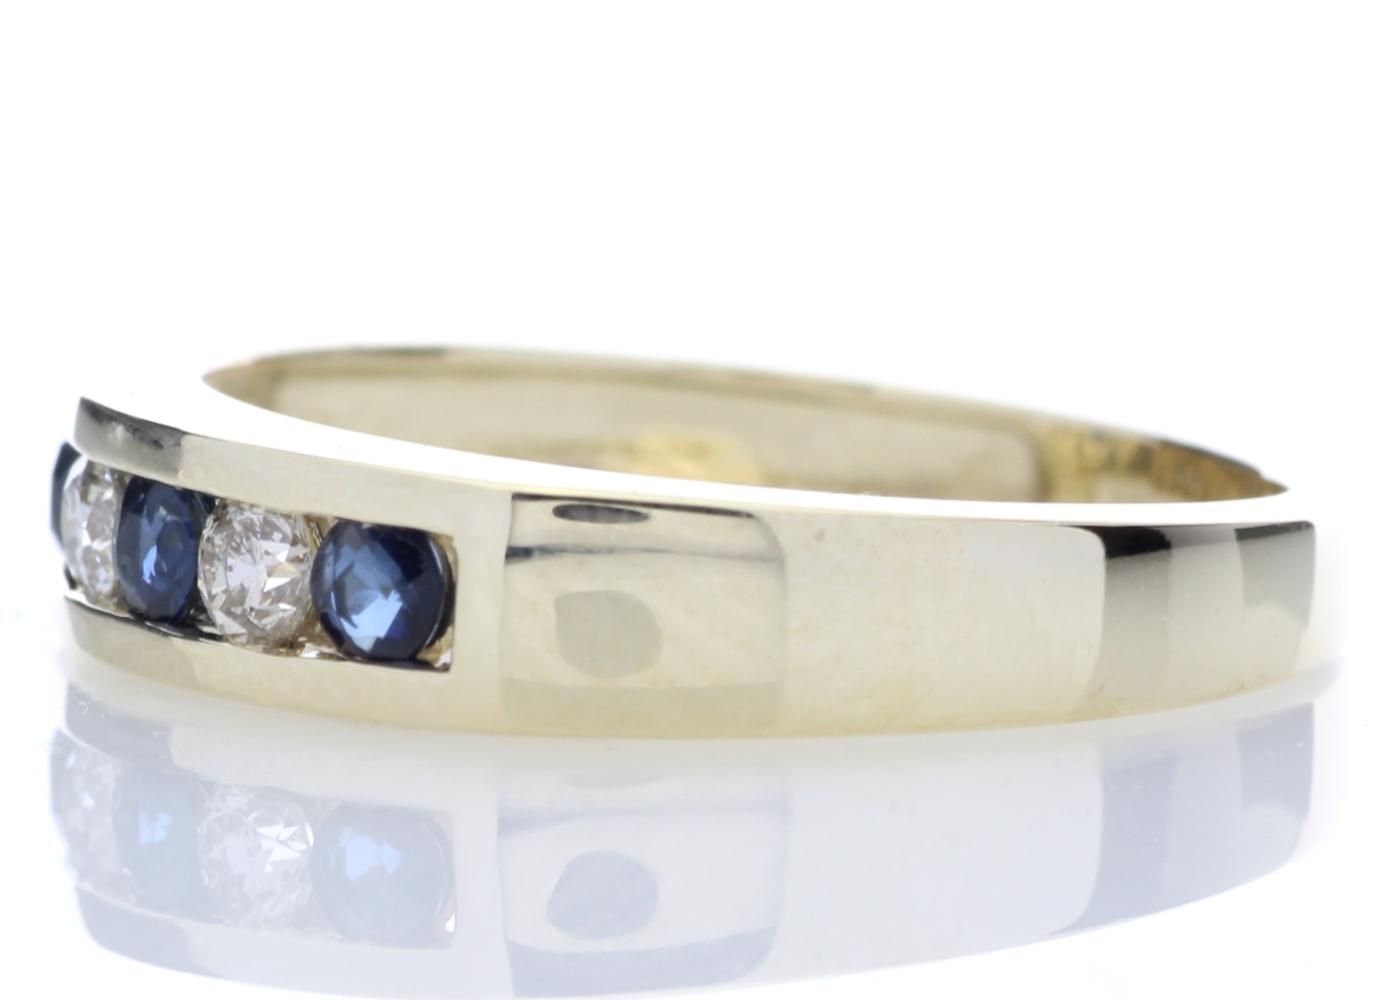 9ct Yellow Gold Channel Set Semi Eternity Diamond Ring 0.25 Carats - Image 3 of 5